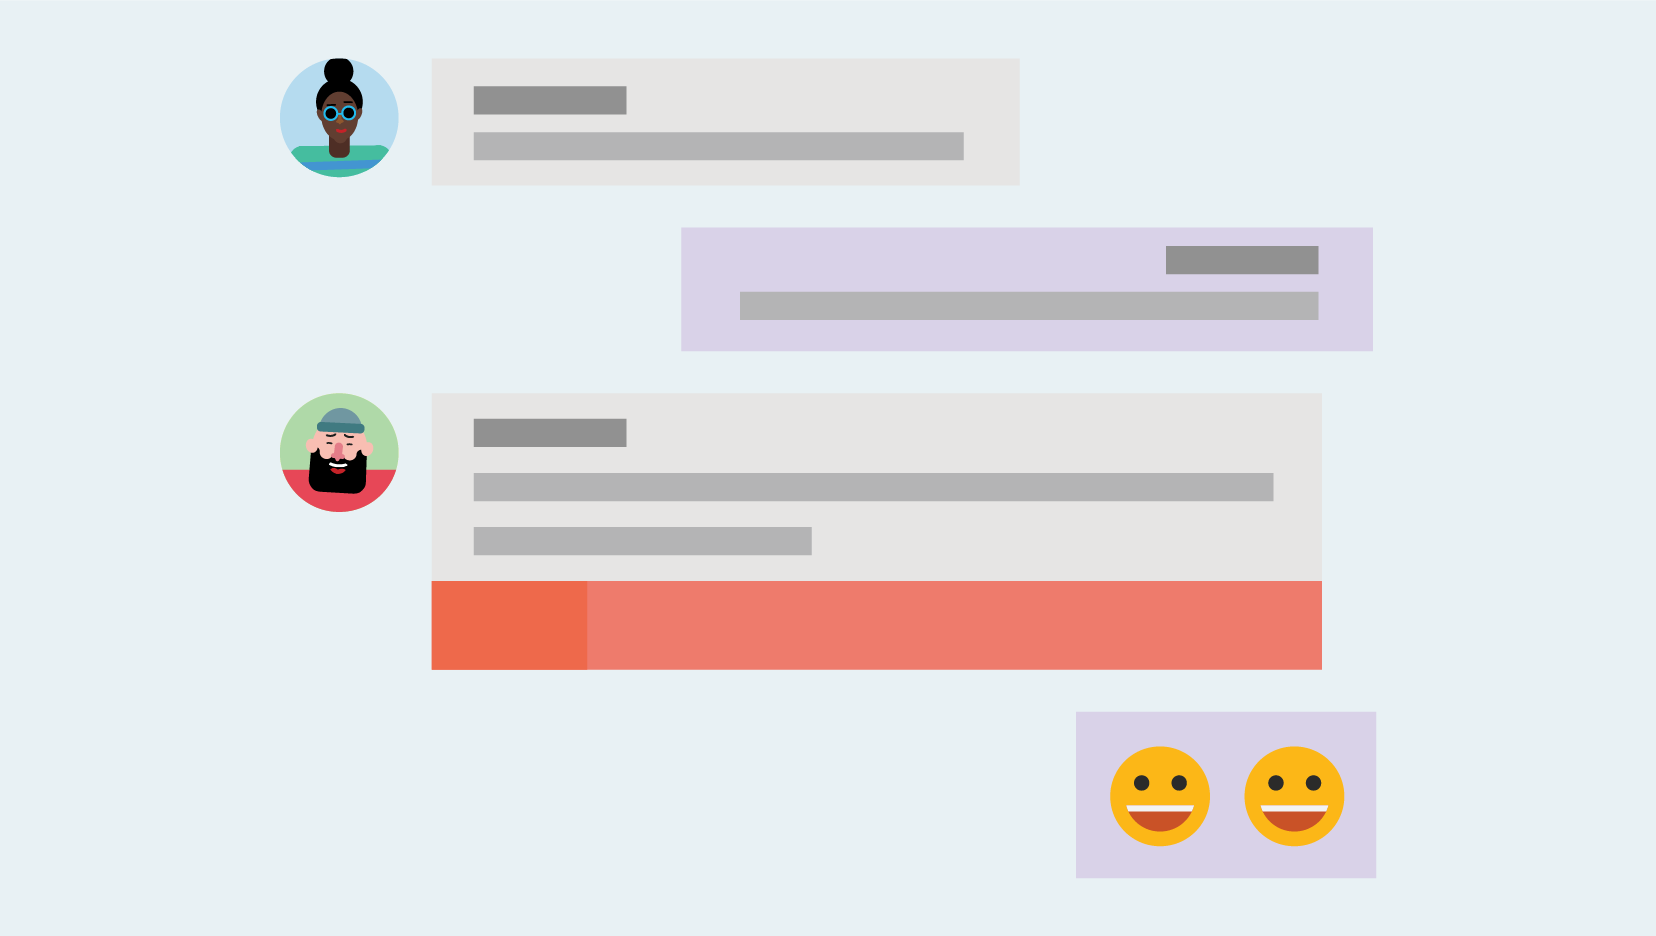 Chatte i grupper